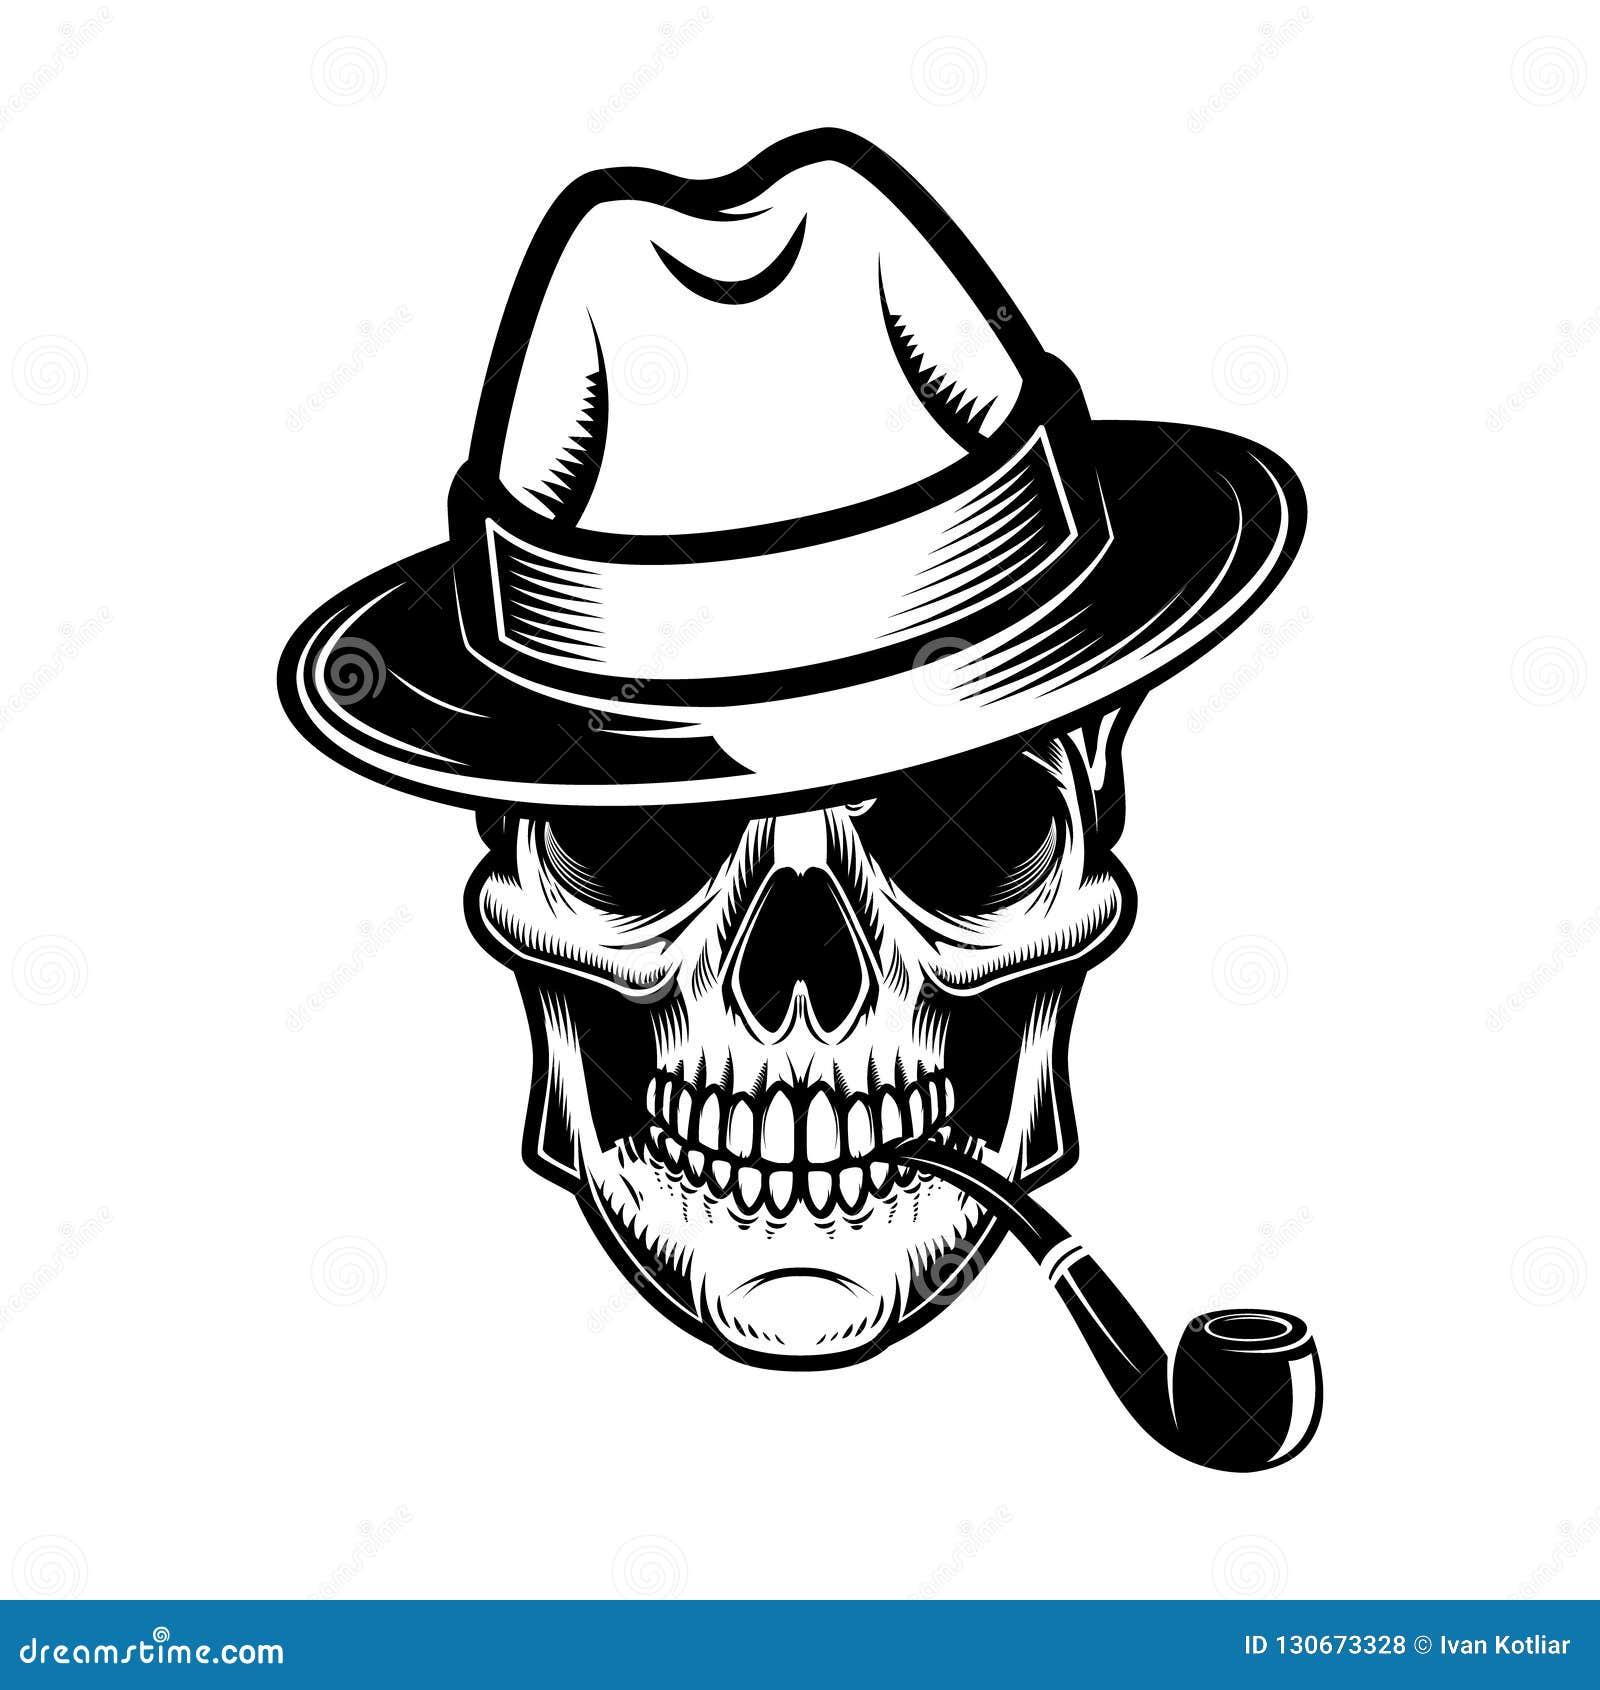 ccb2e7da06c Skull hat smoking pipe design element logo label emblem sign skull hat  smoking pipe design element